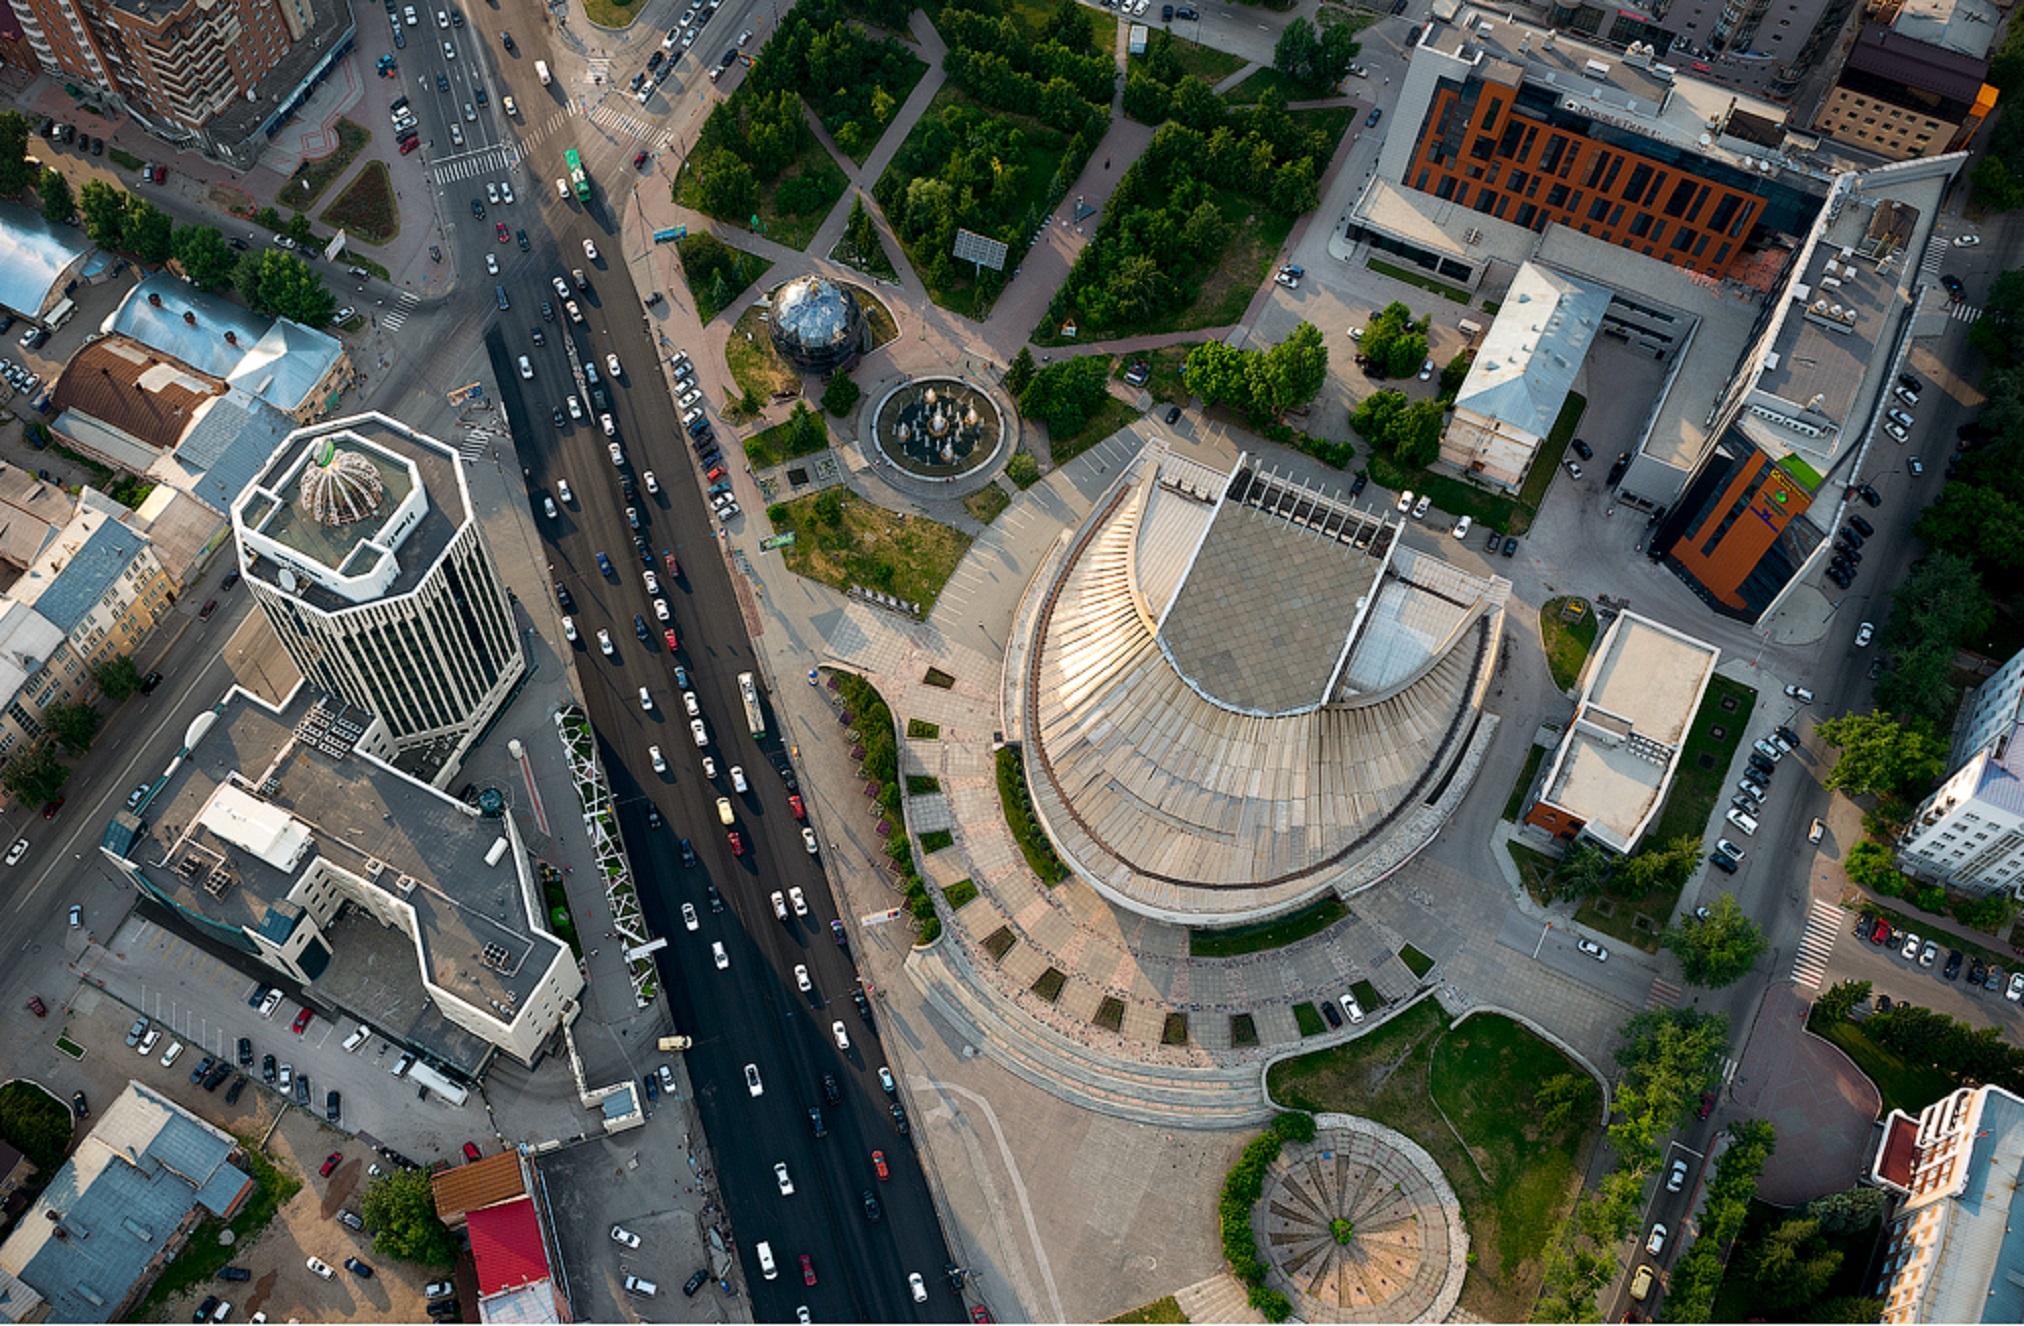 16 - Sibéria capital